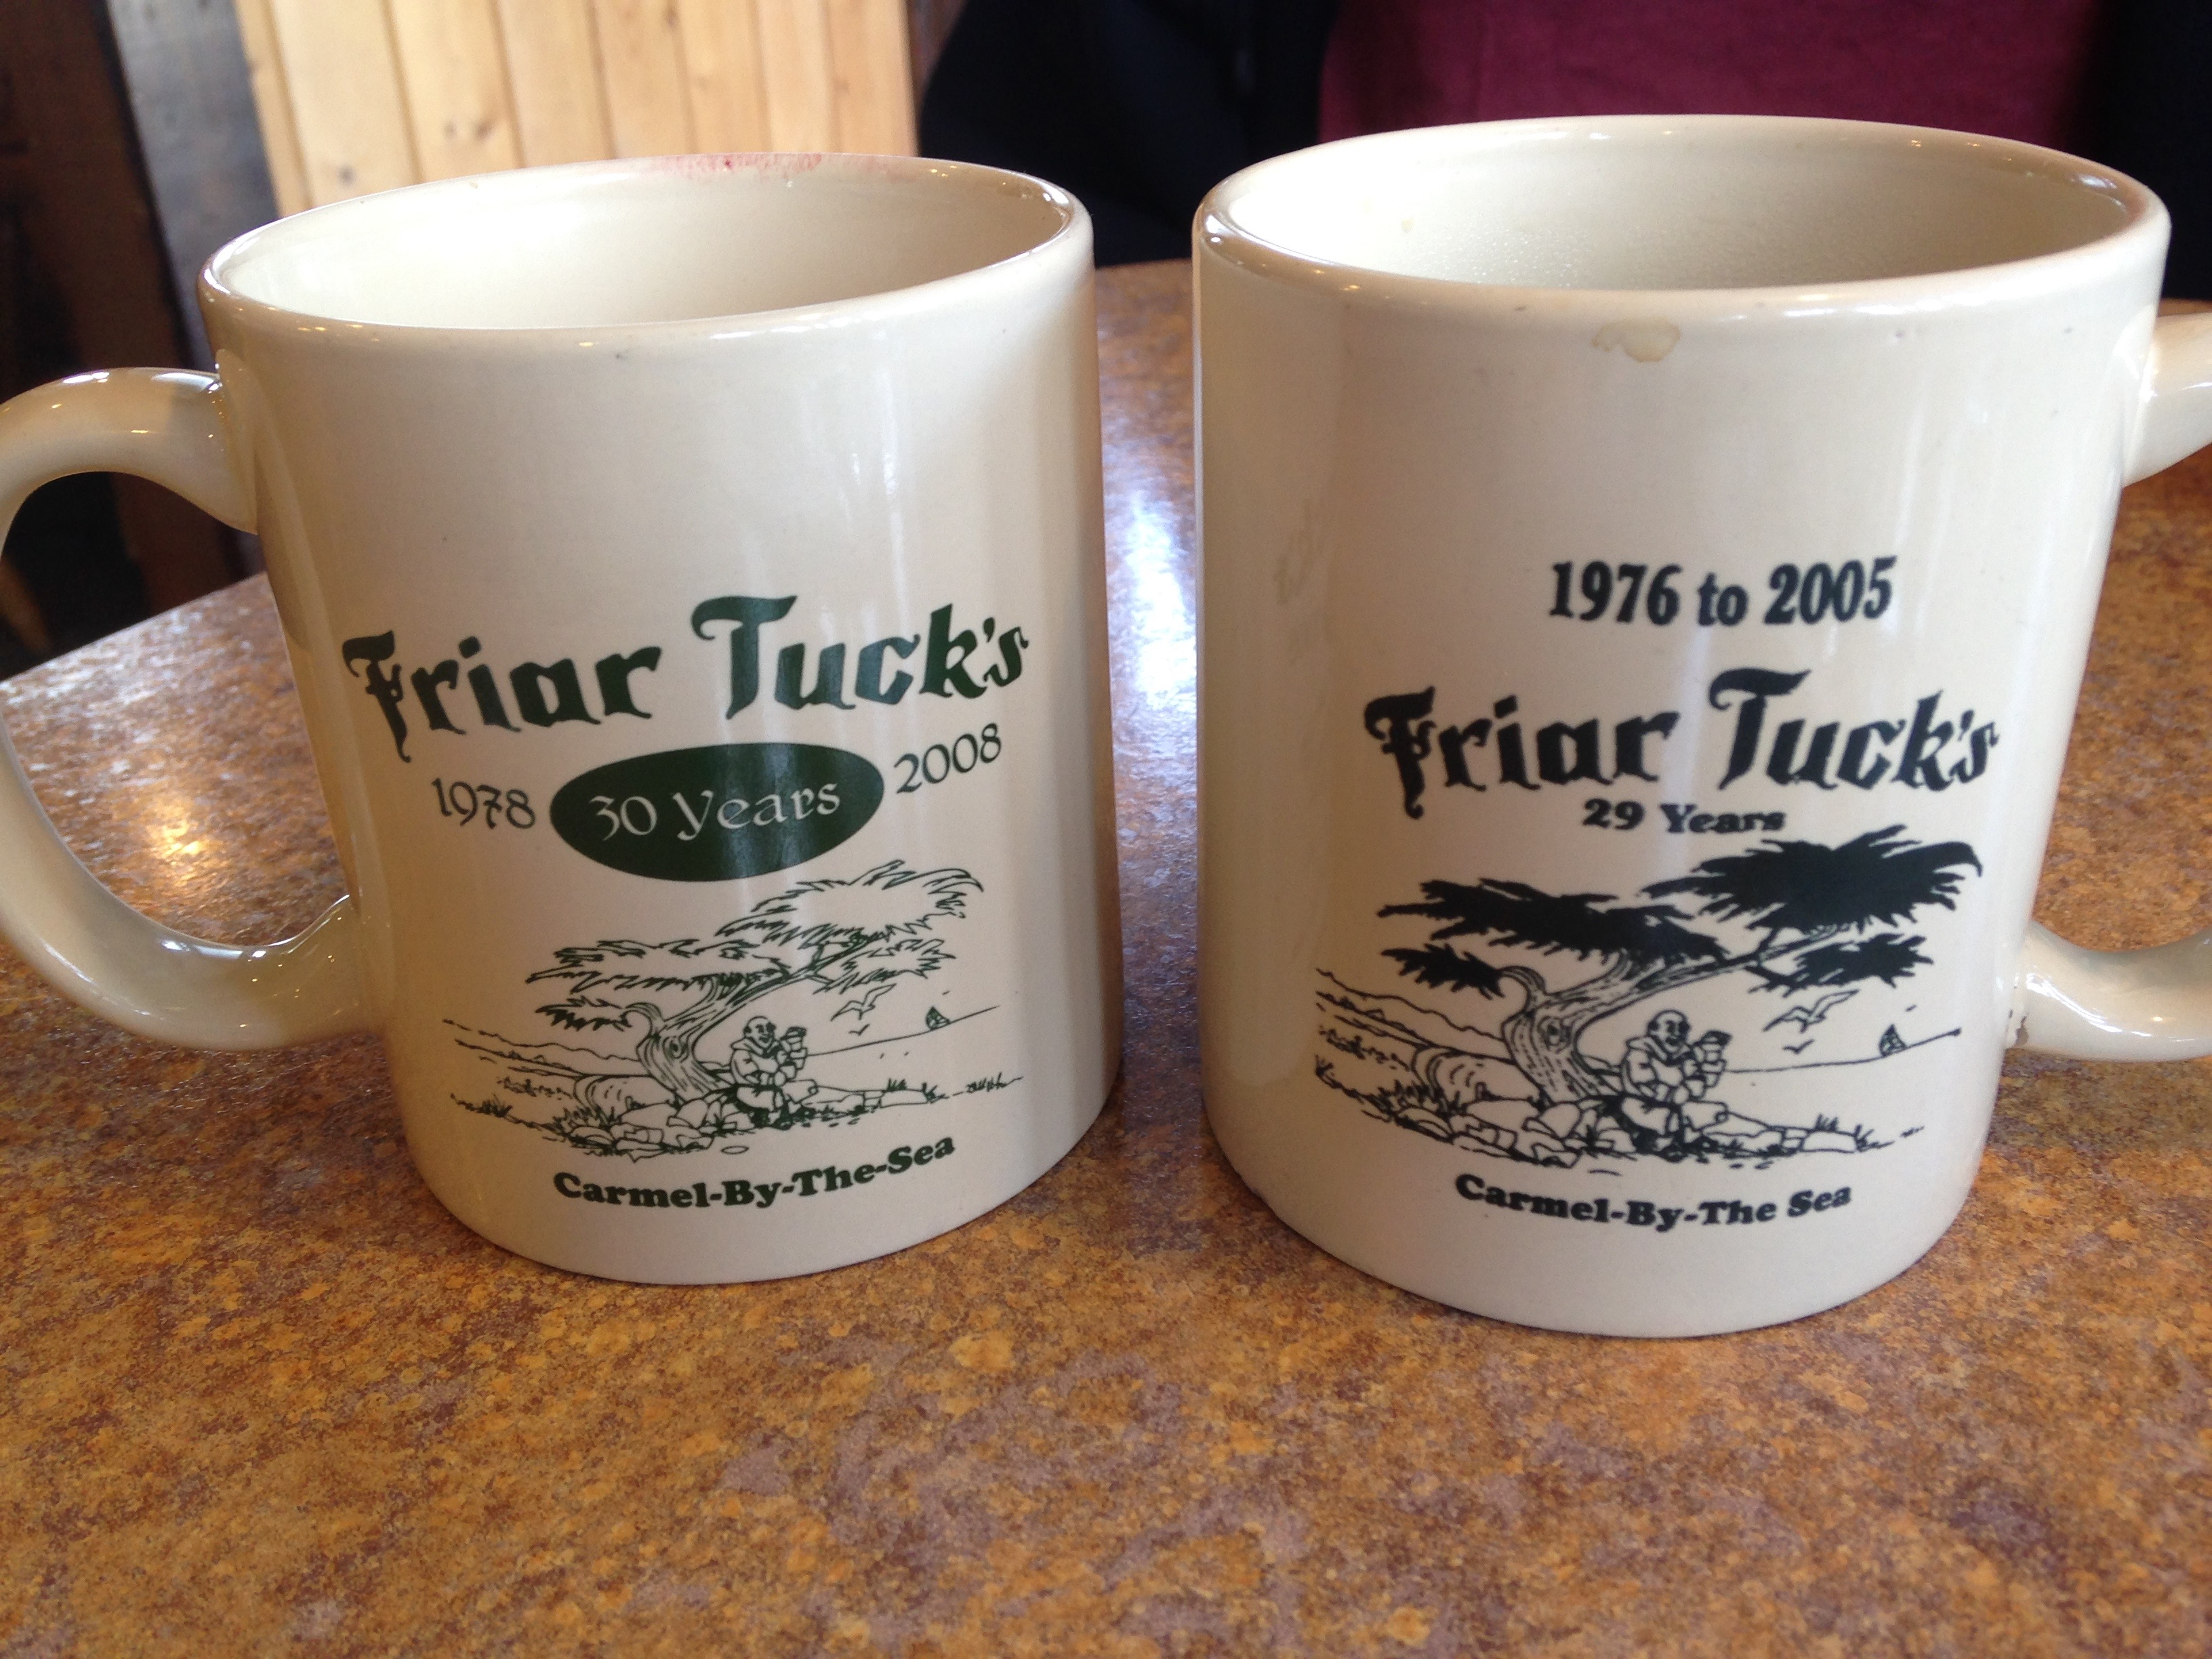 Friar Tucks restaurant in Carmel